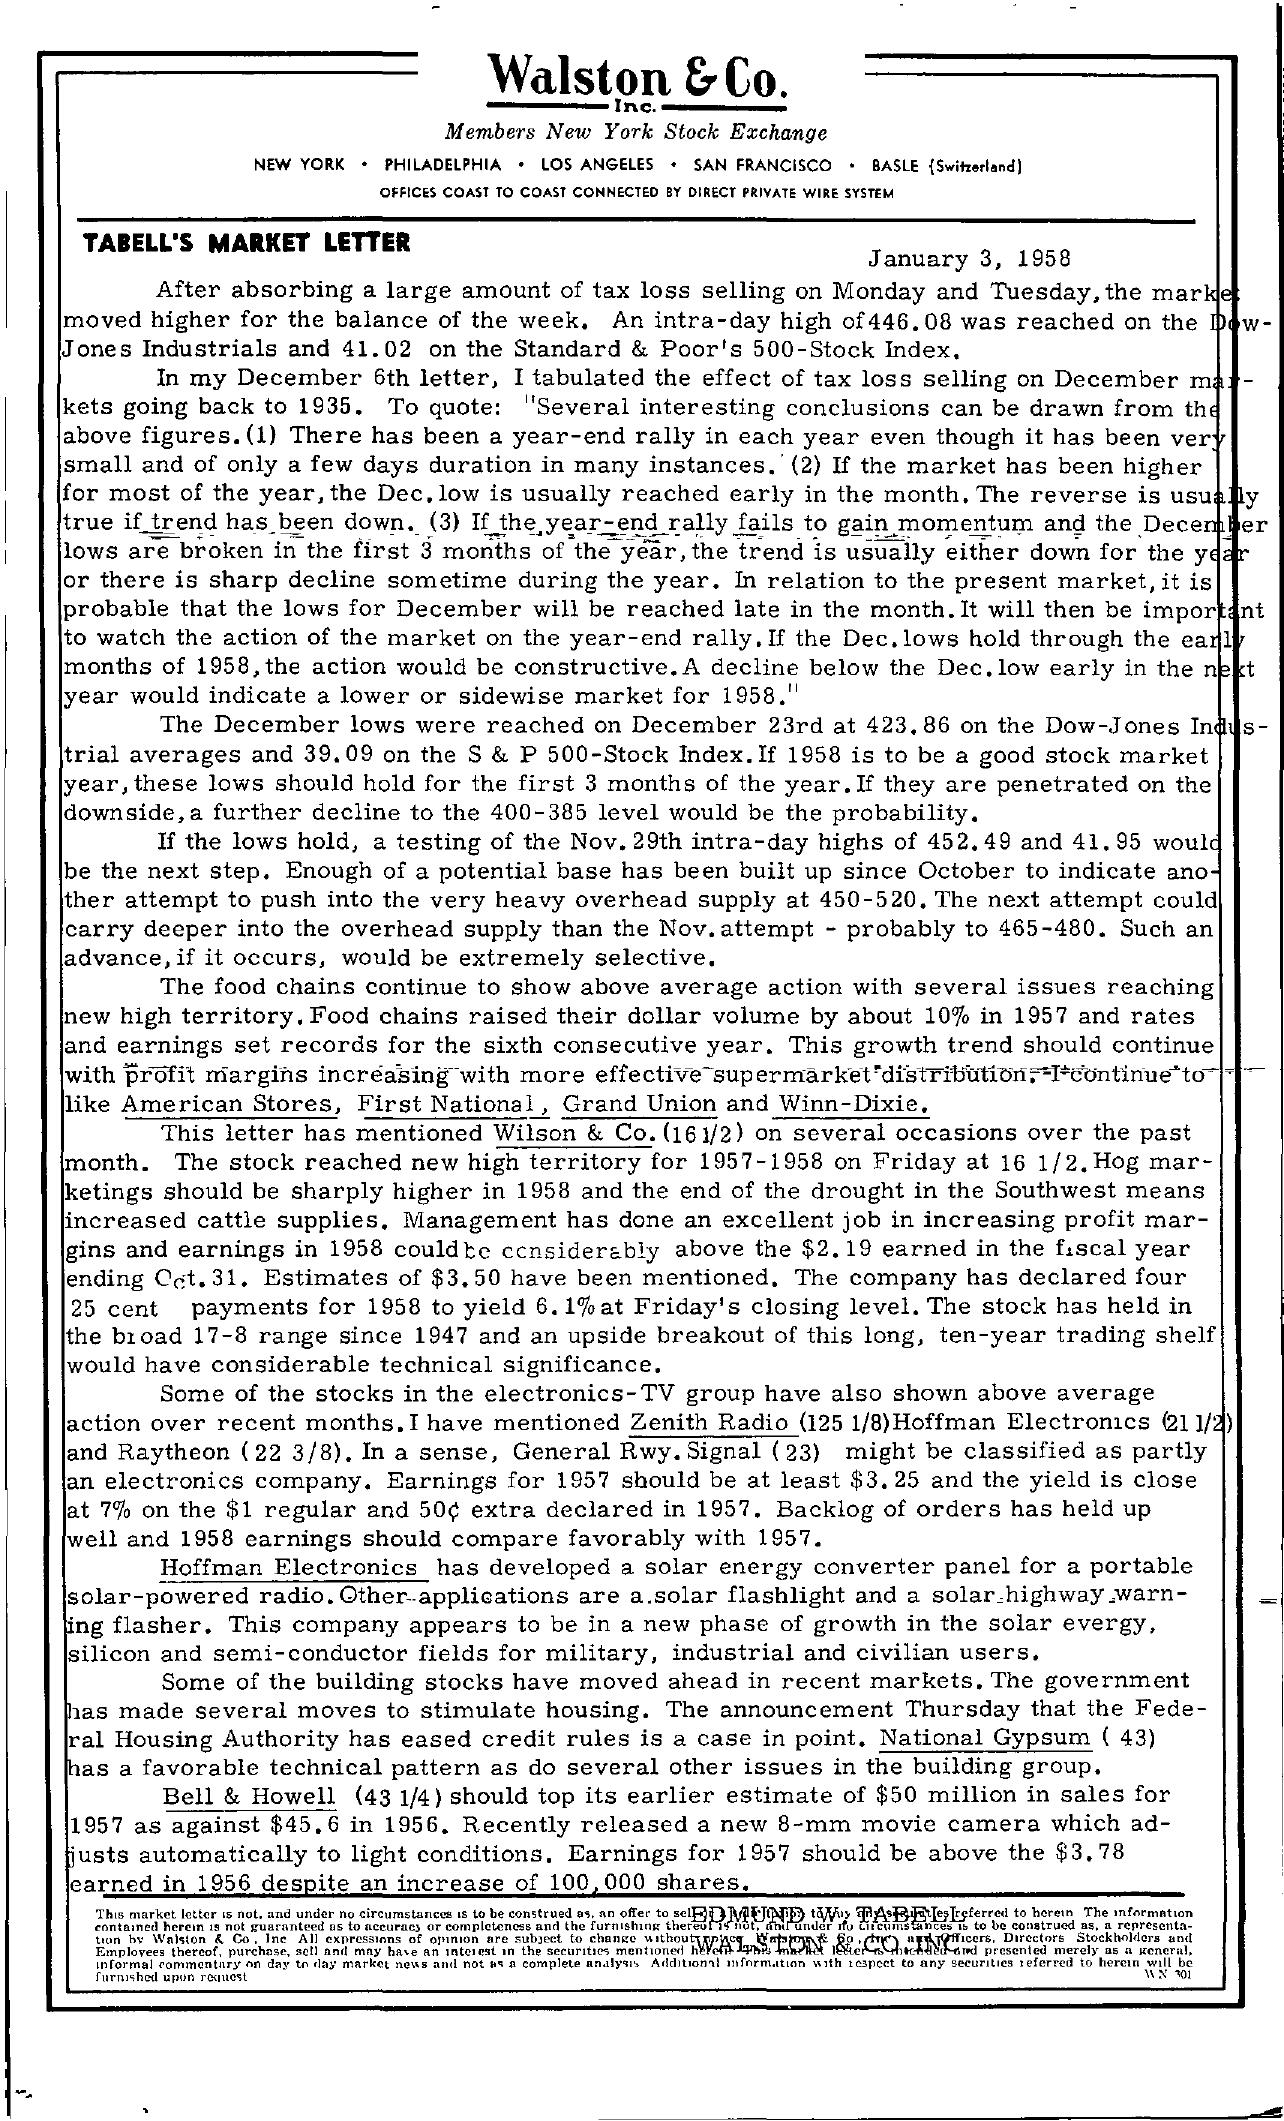 Tabell's Market Letter - January 03, 1958